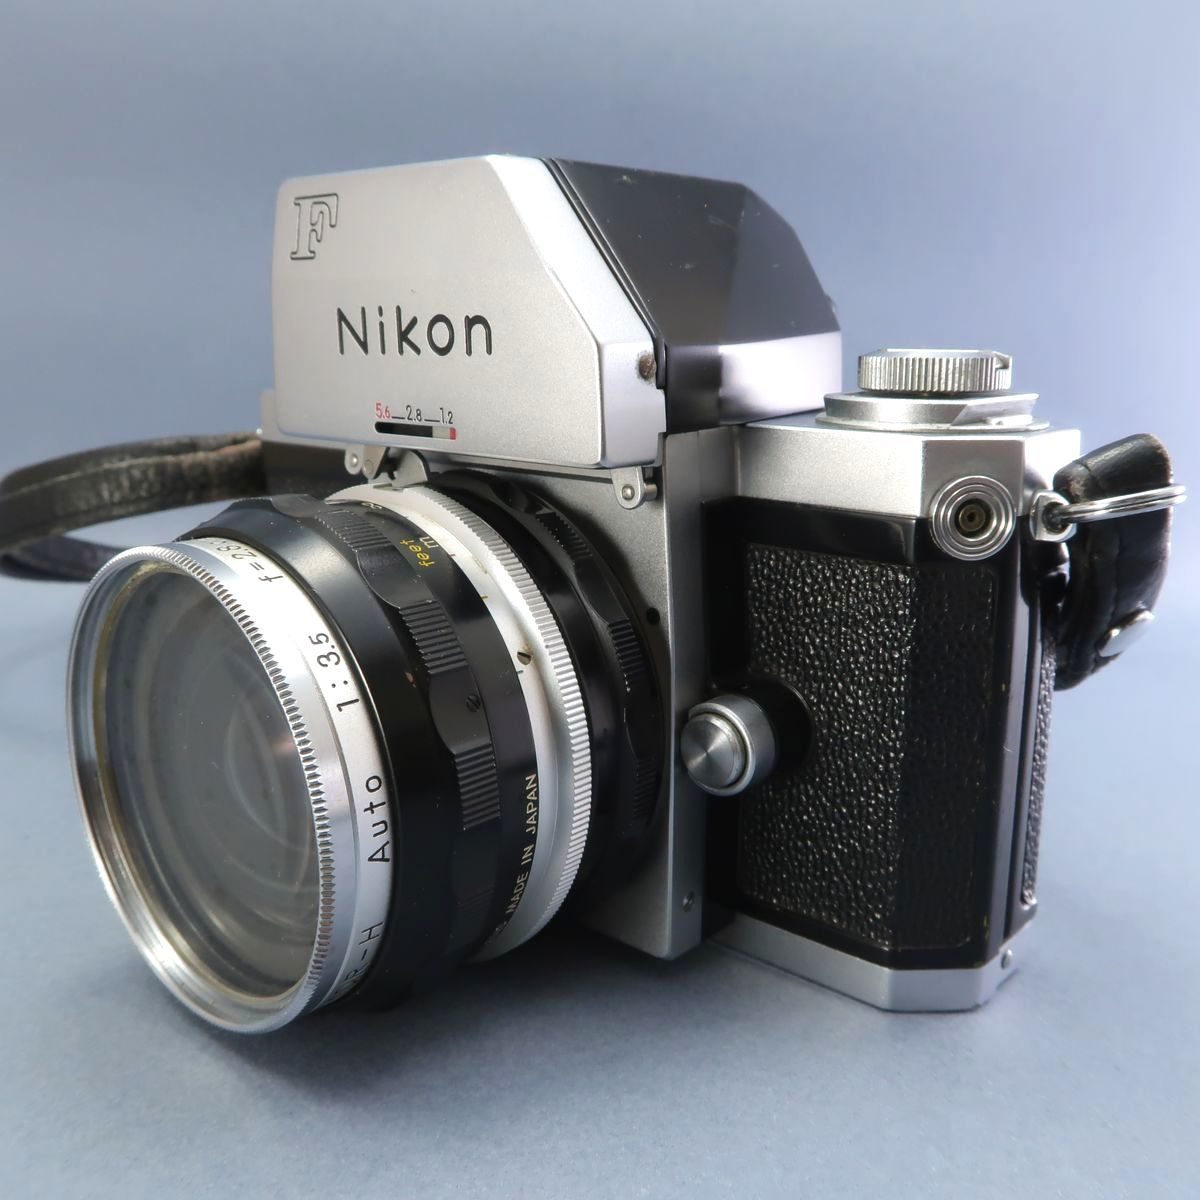 ★Nikon F フィルムカメラ 本体 レンズ Nikkor-Auto 105mm F 2.5 28mm F 3.5 NIKKOR-H Auto 1:3.5 f=2.8cm FTN 付属多数 ジャンク_画像2